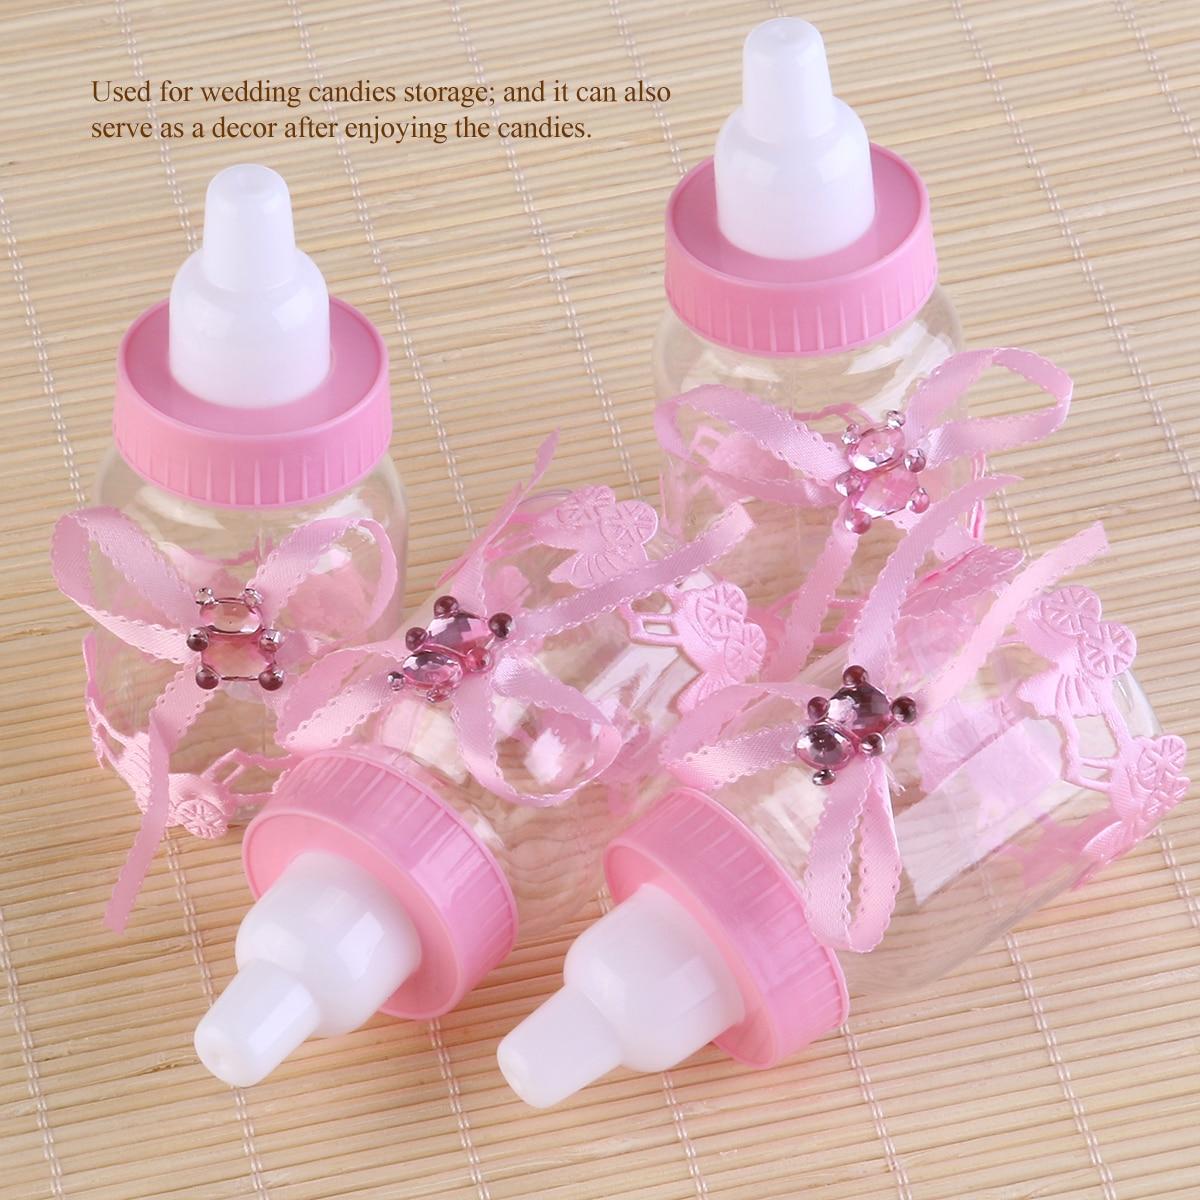 12pcs Feeding Milk Bottle Style Candy Bottle Gift Box Baby Shower